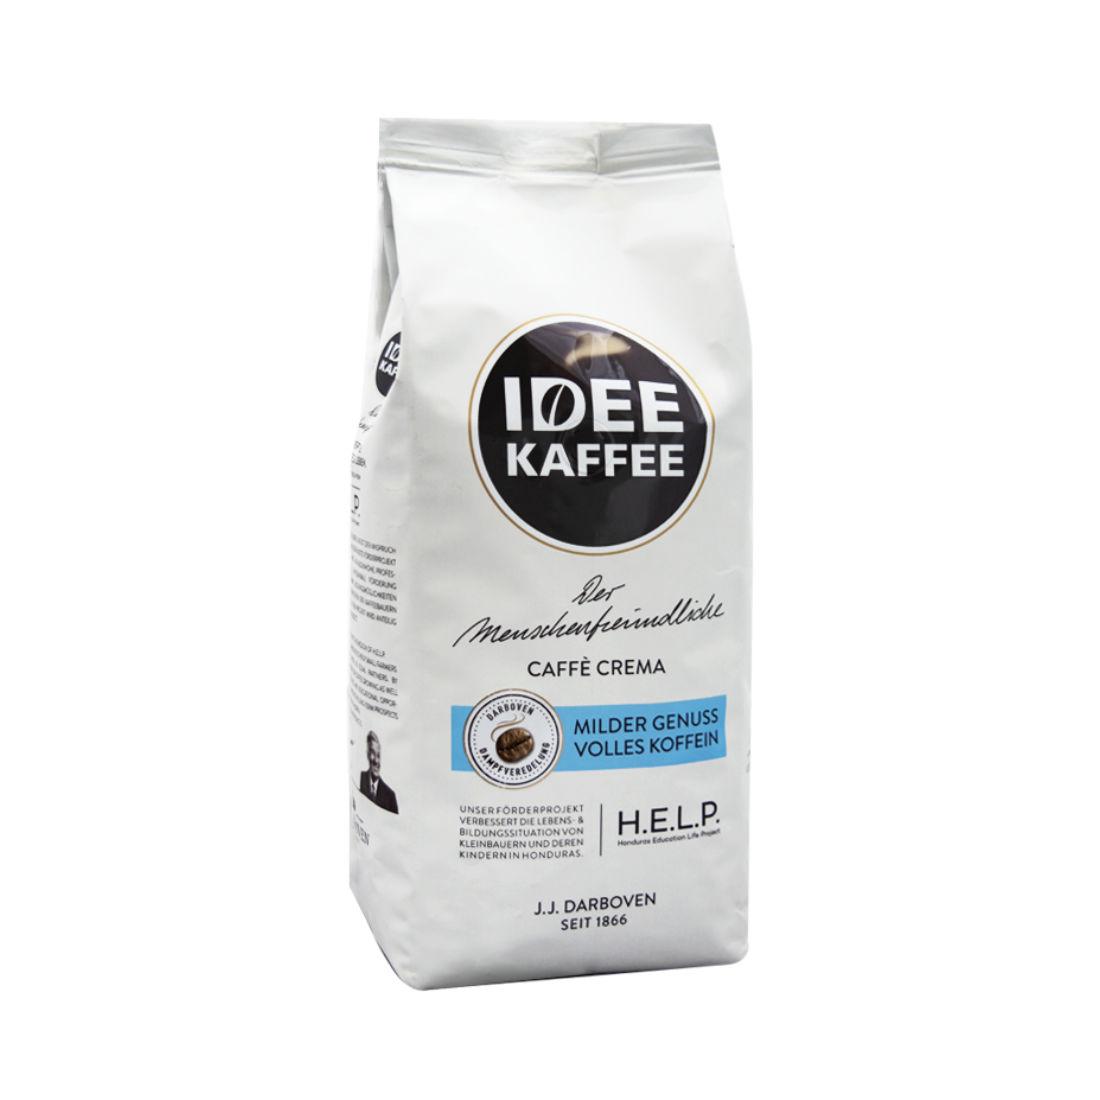 kawa idee kaffee classic caffe crema